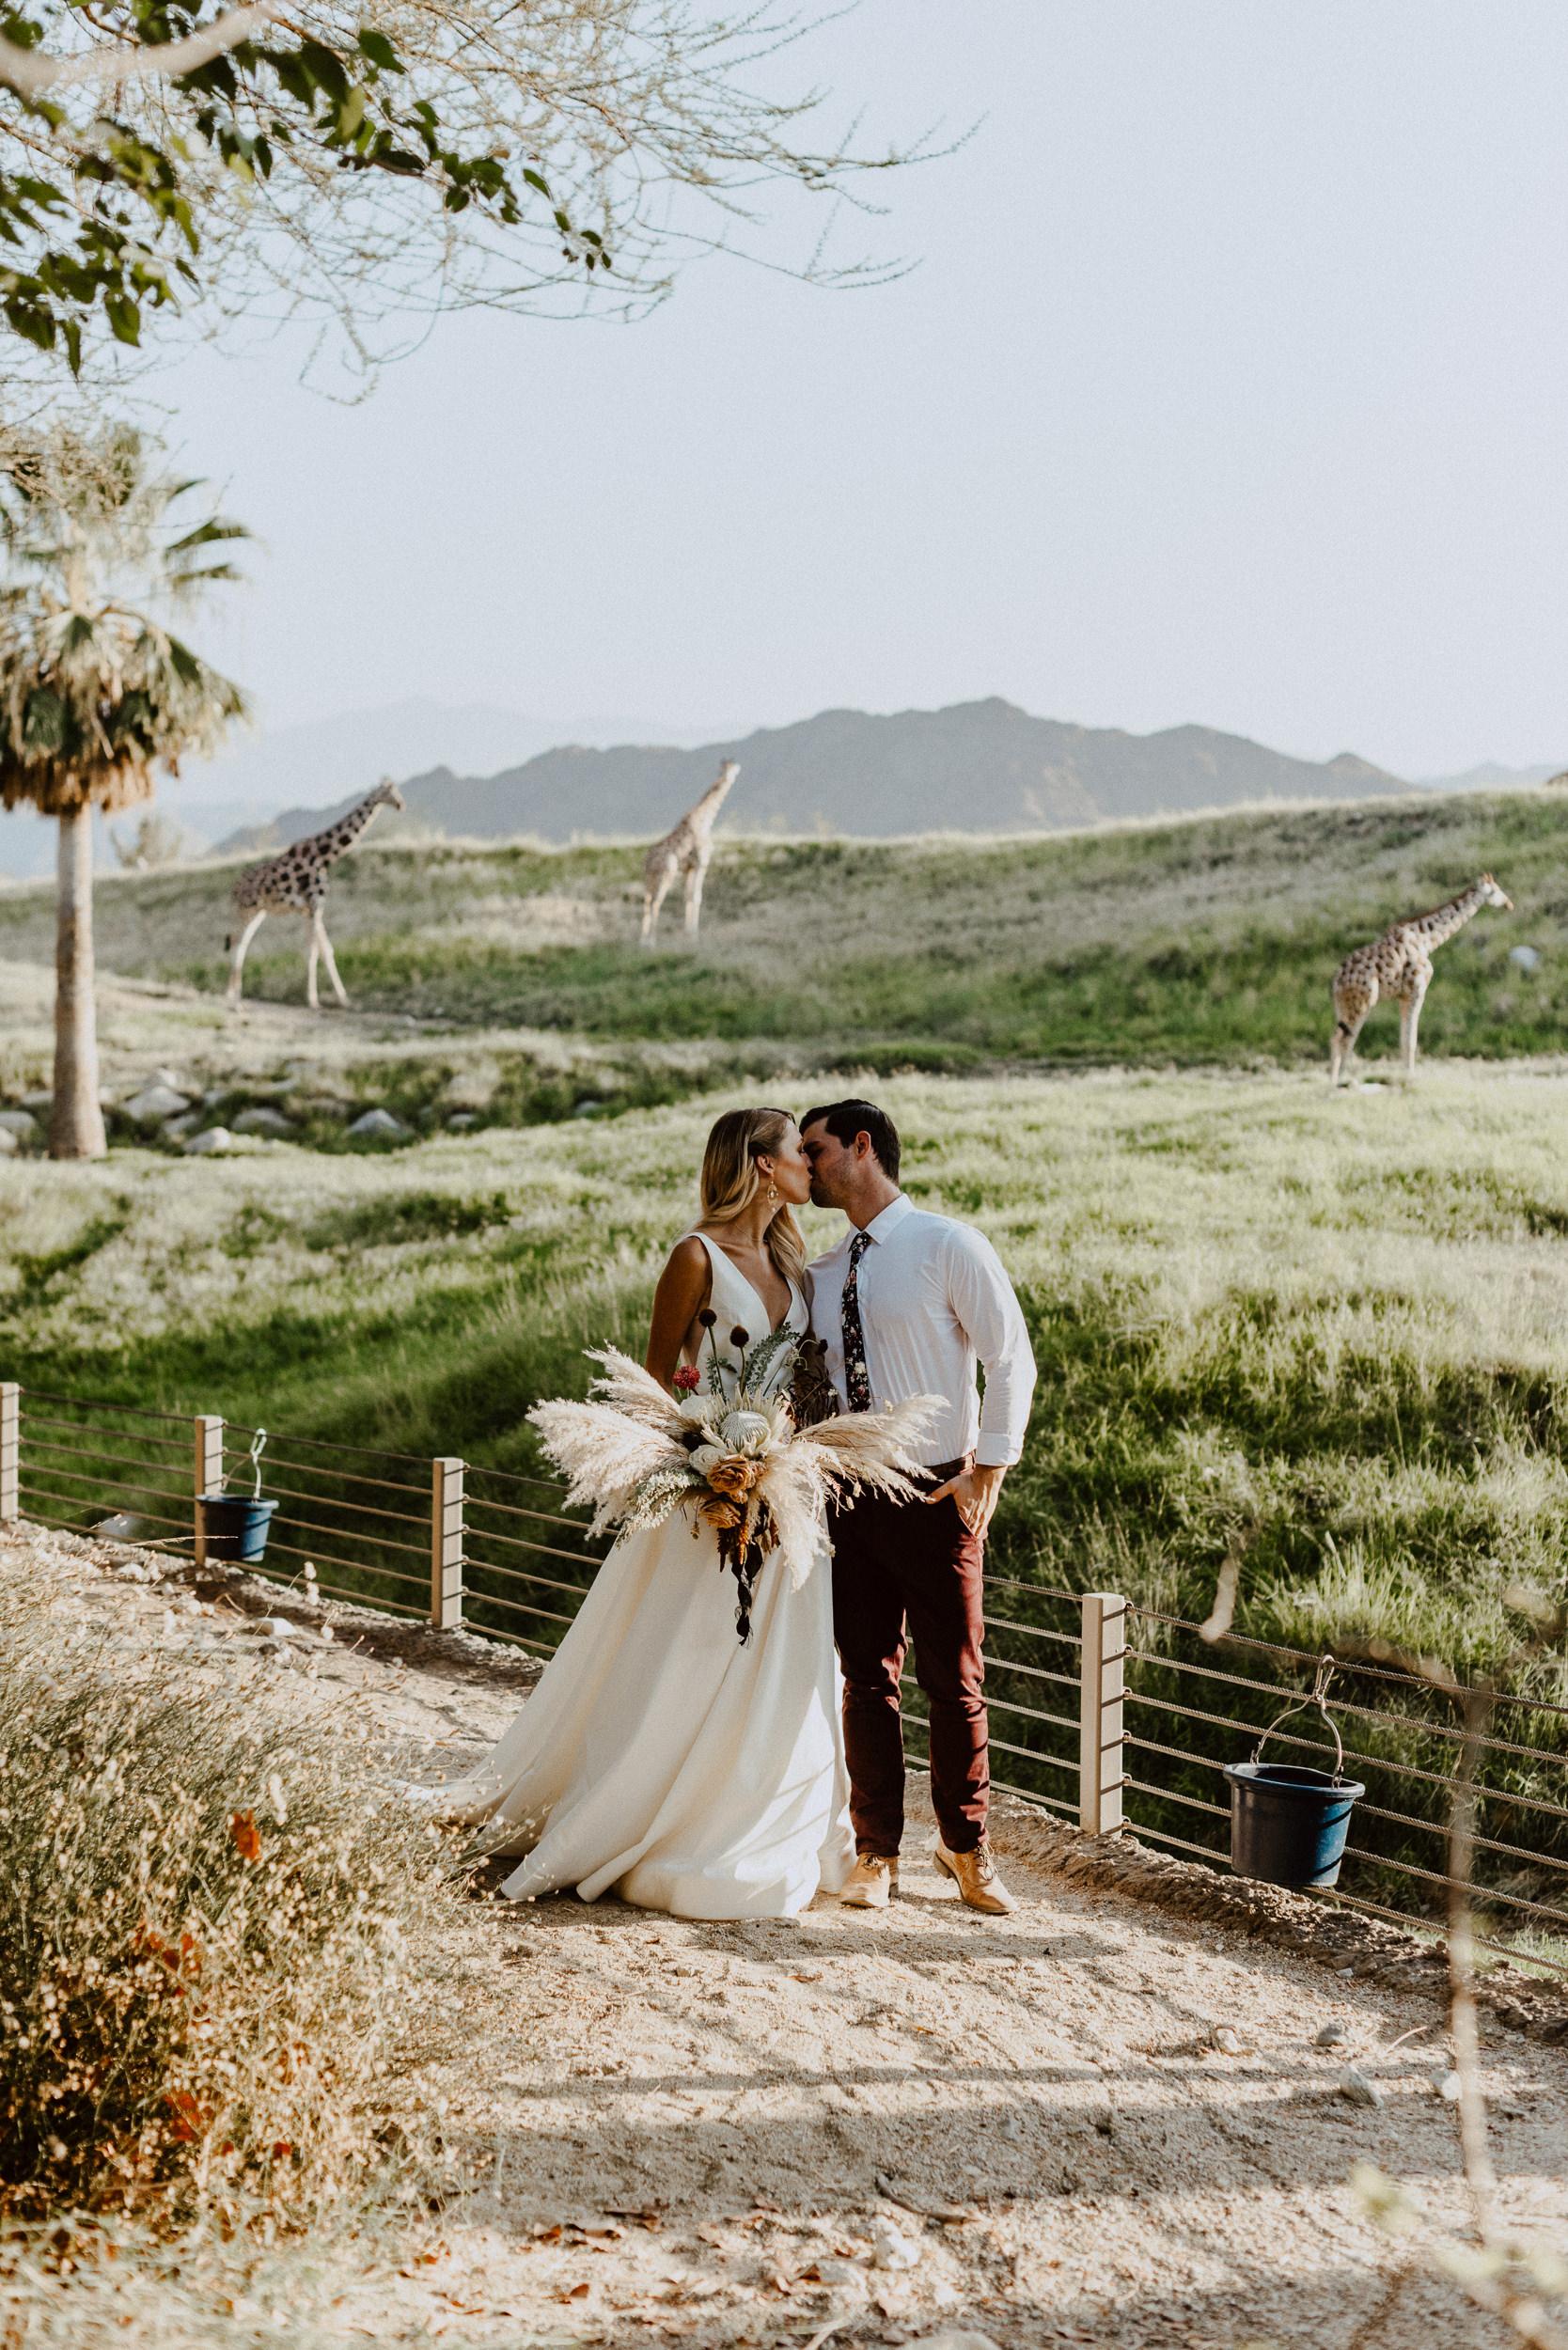 sChelsie + Chris - The Desert Shootout Wedding Romantics at The Living Desert-90.jpg